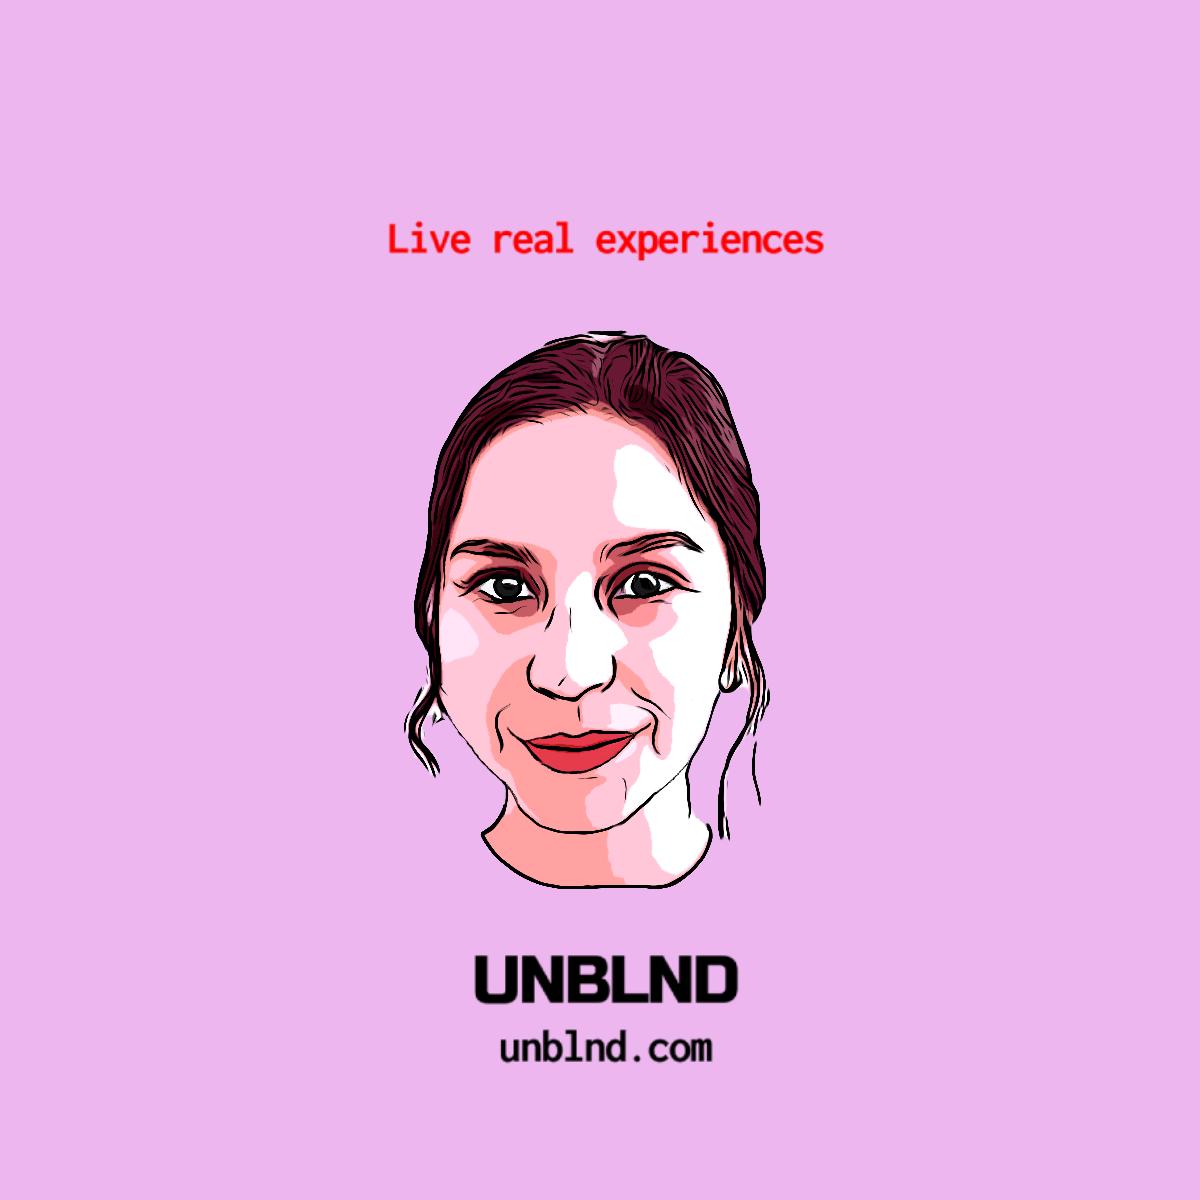 Ambassador Iara - Make new friends | UNBLND